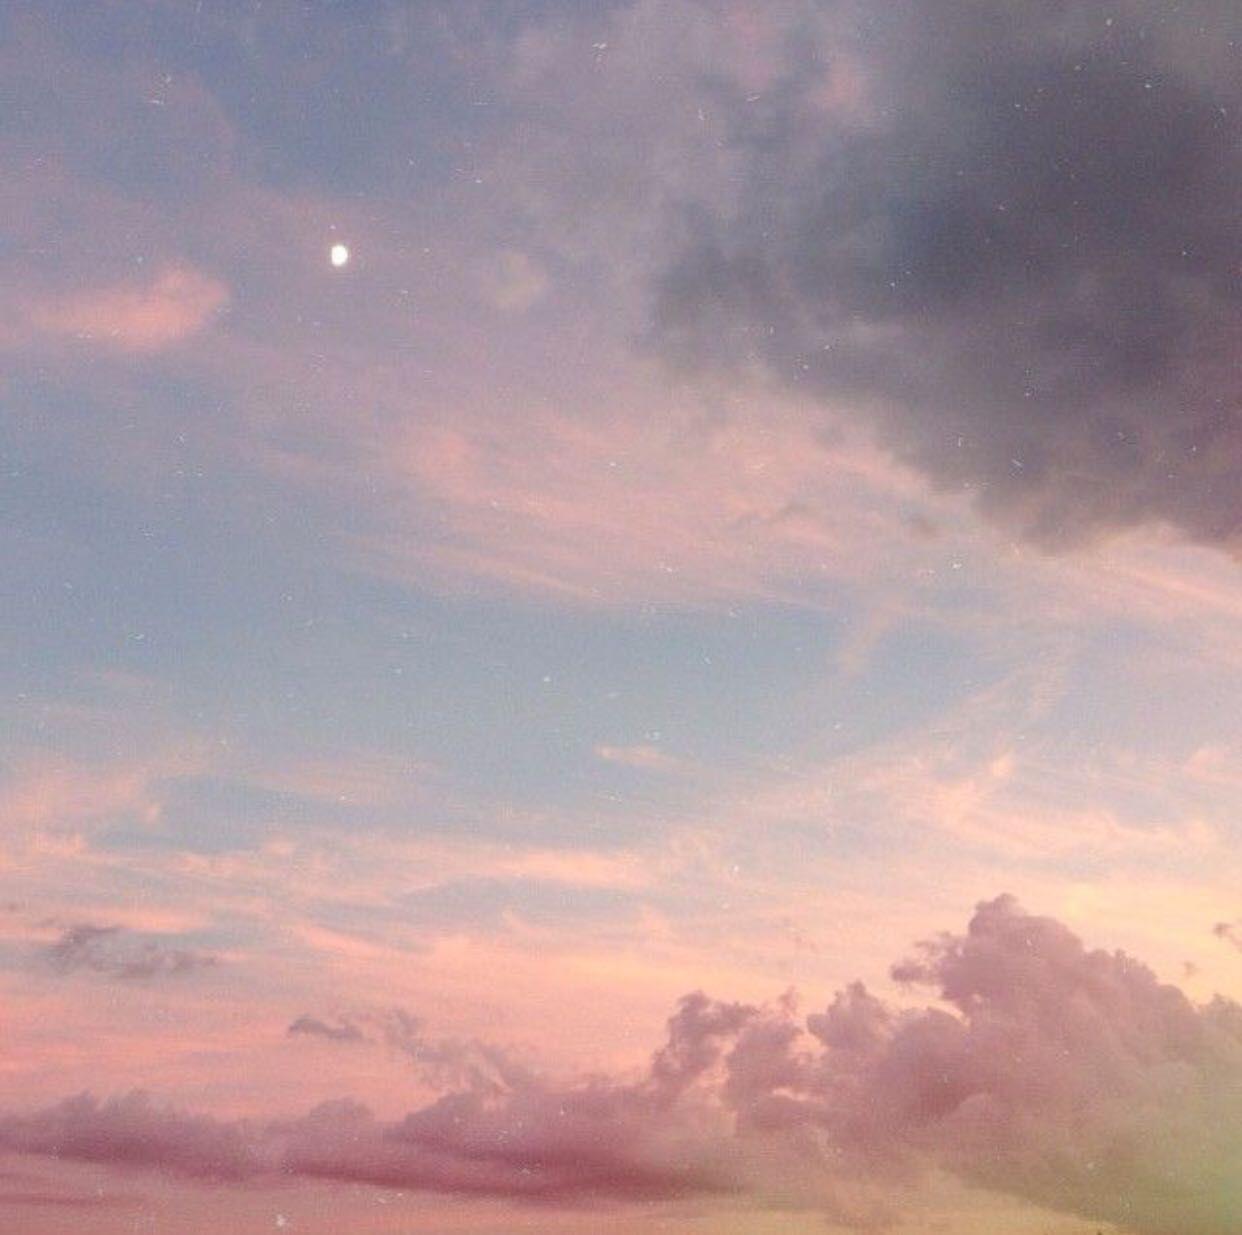 bts icons headersˎˊ pretty sky sky aesthetic clouds bts icons headersˎˊ pretty sky